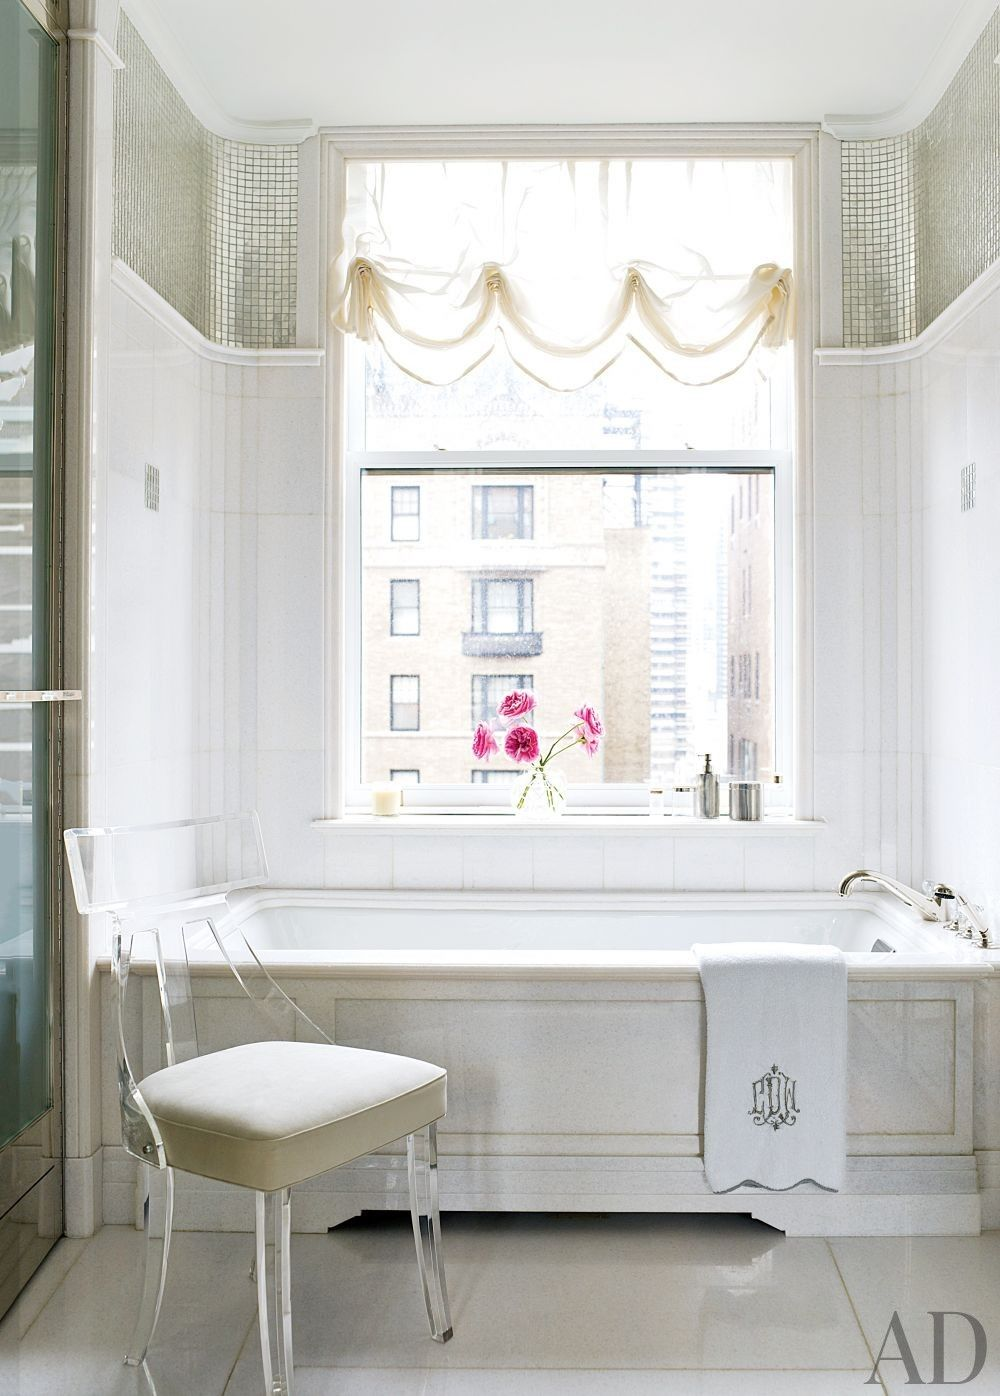 Traditional Bathroom by David Kleinberg Design Associates and David Kleinberg Design Associates in New York, New York